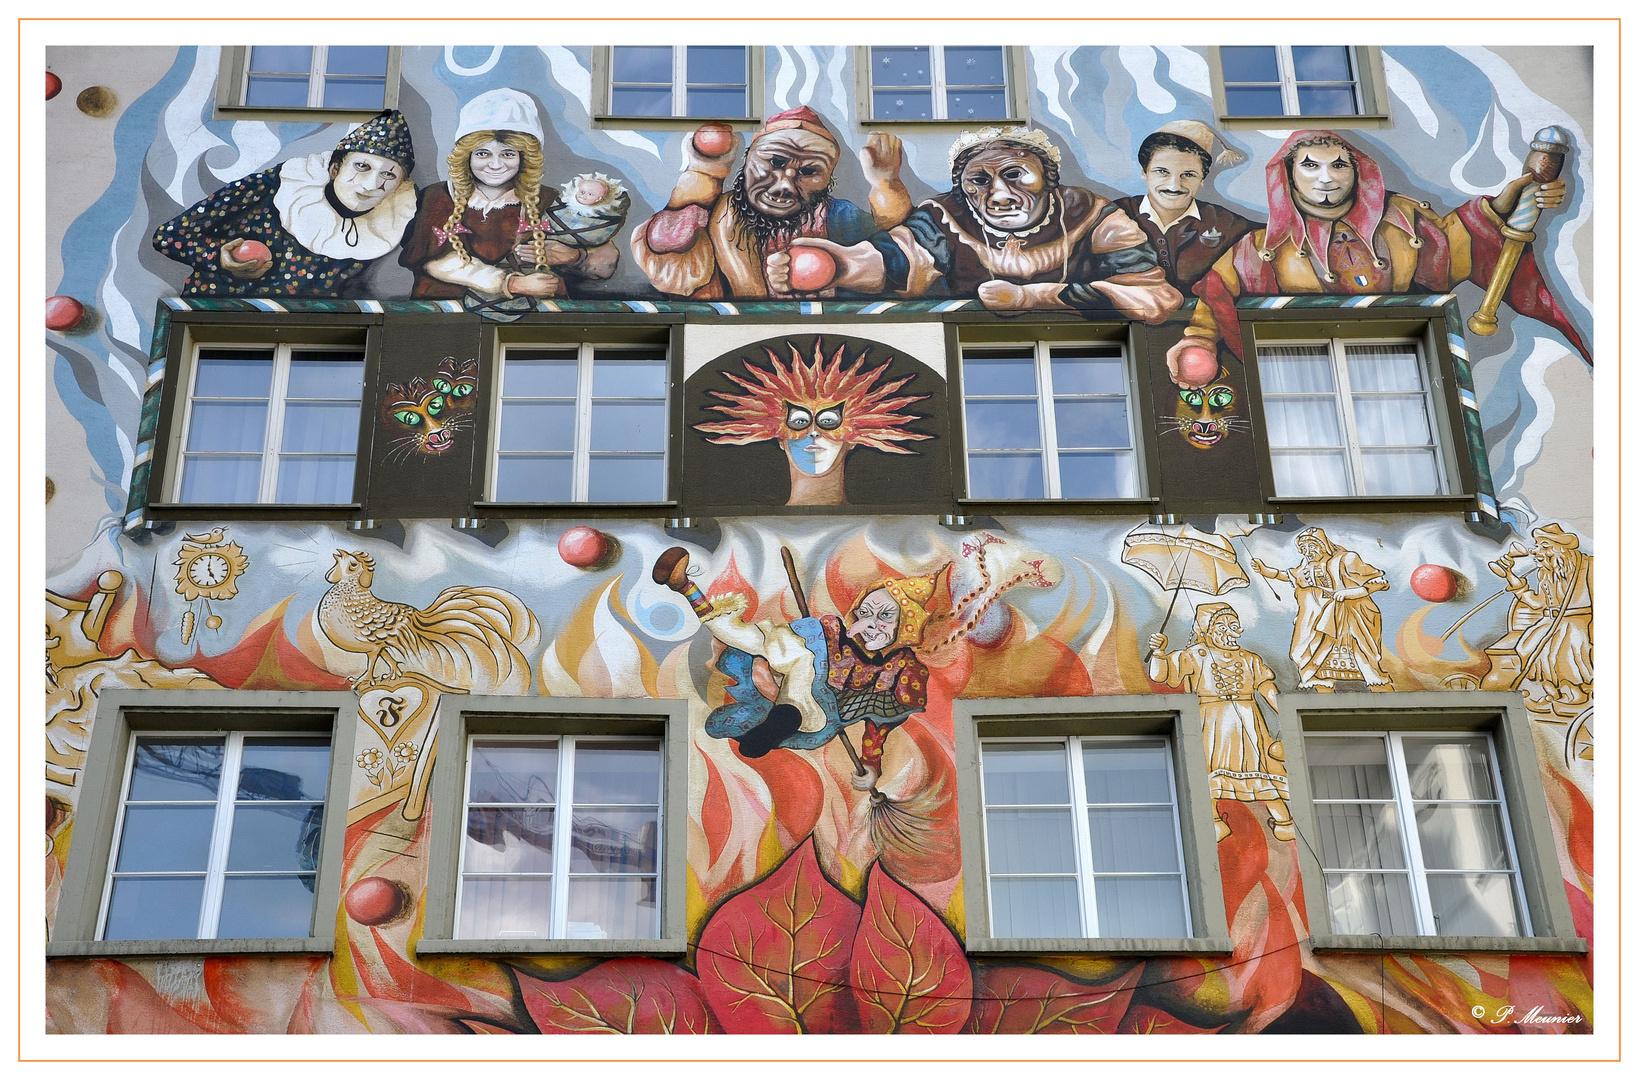 Hôtel carnavalesque